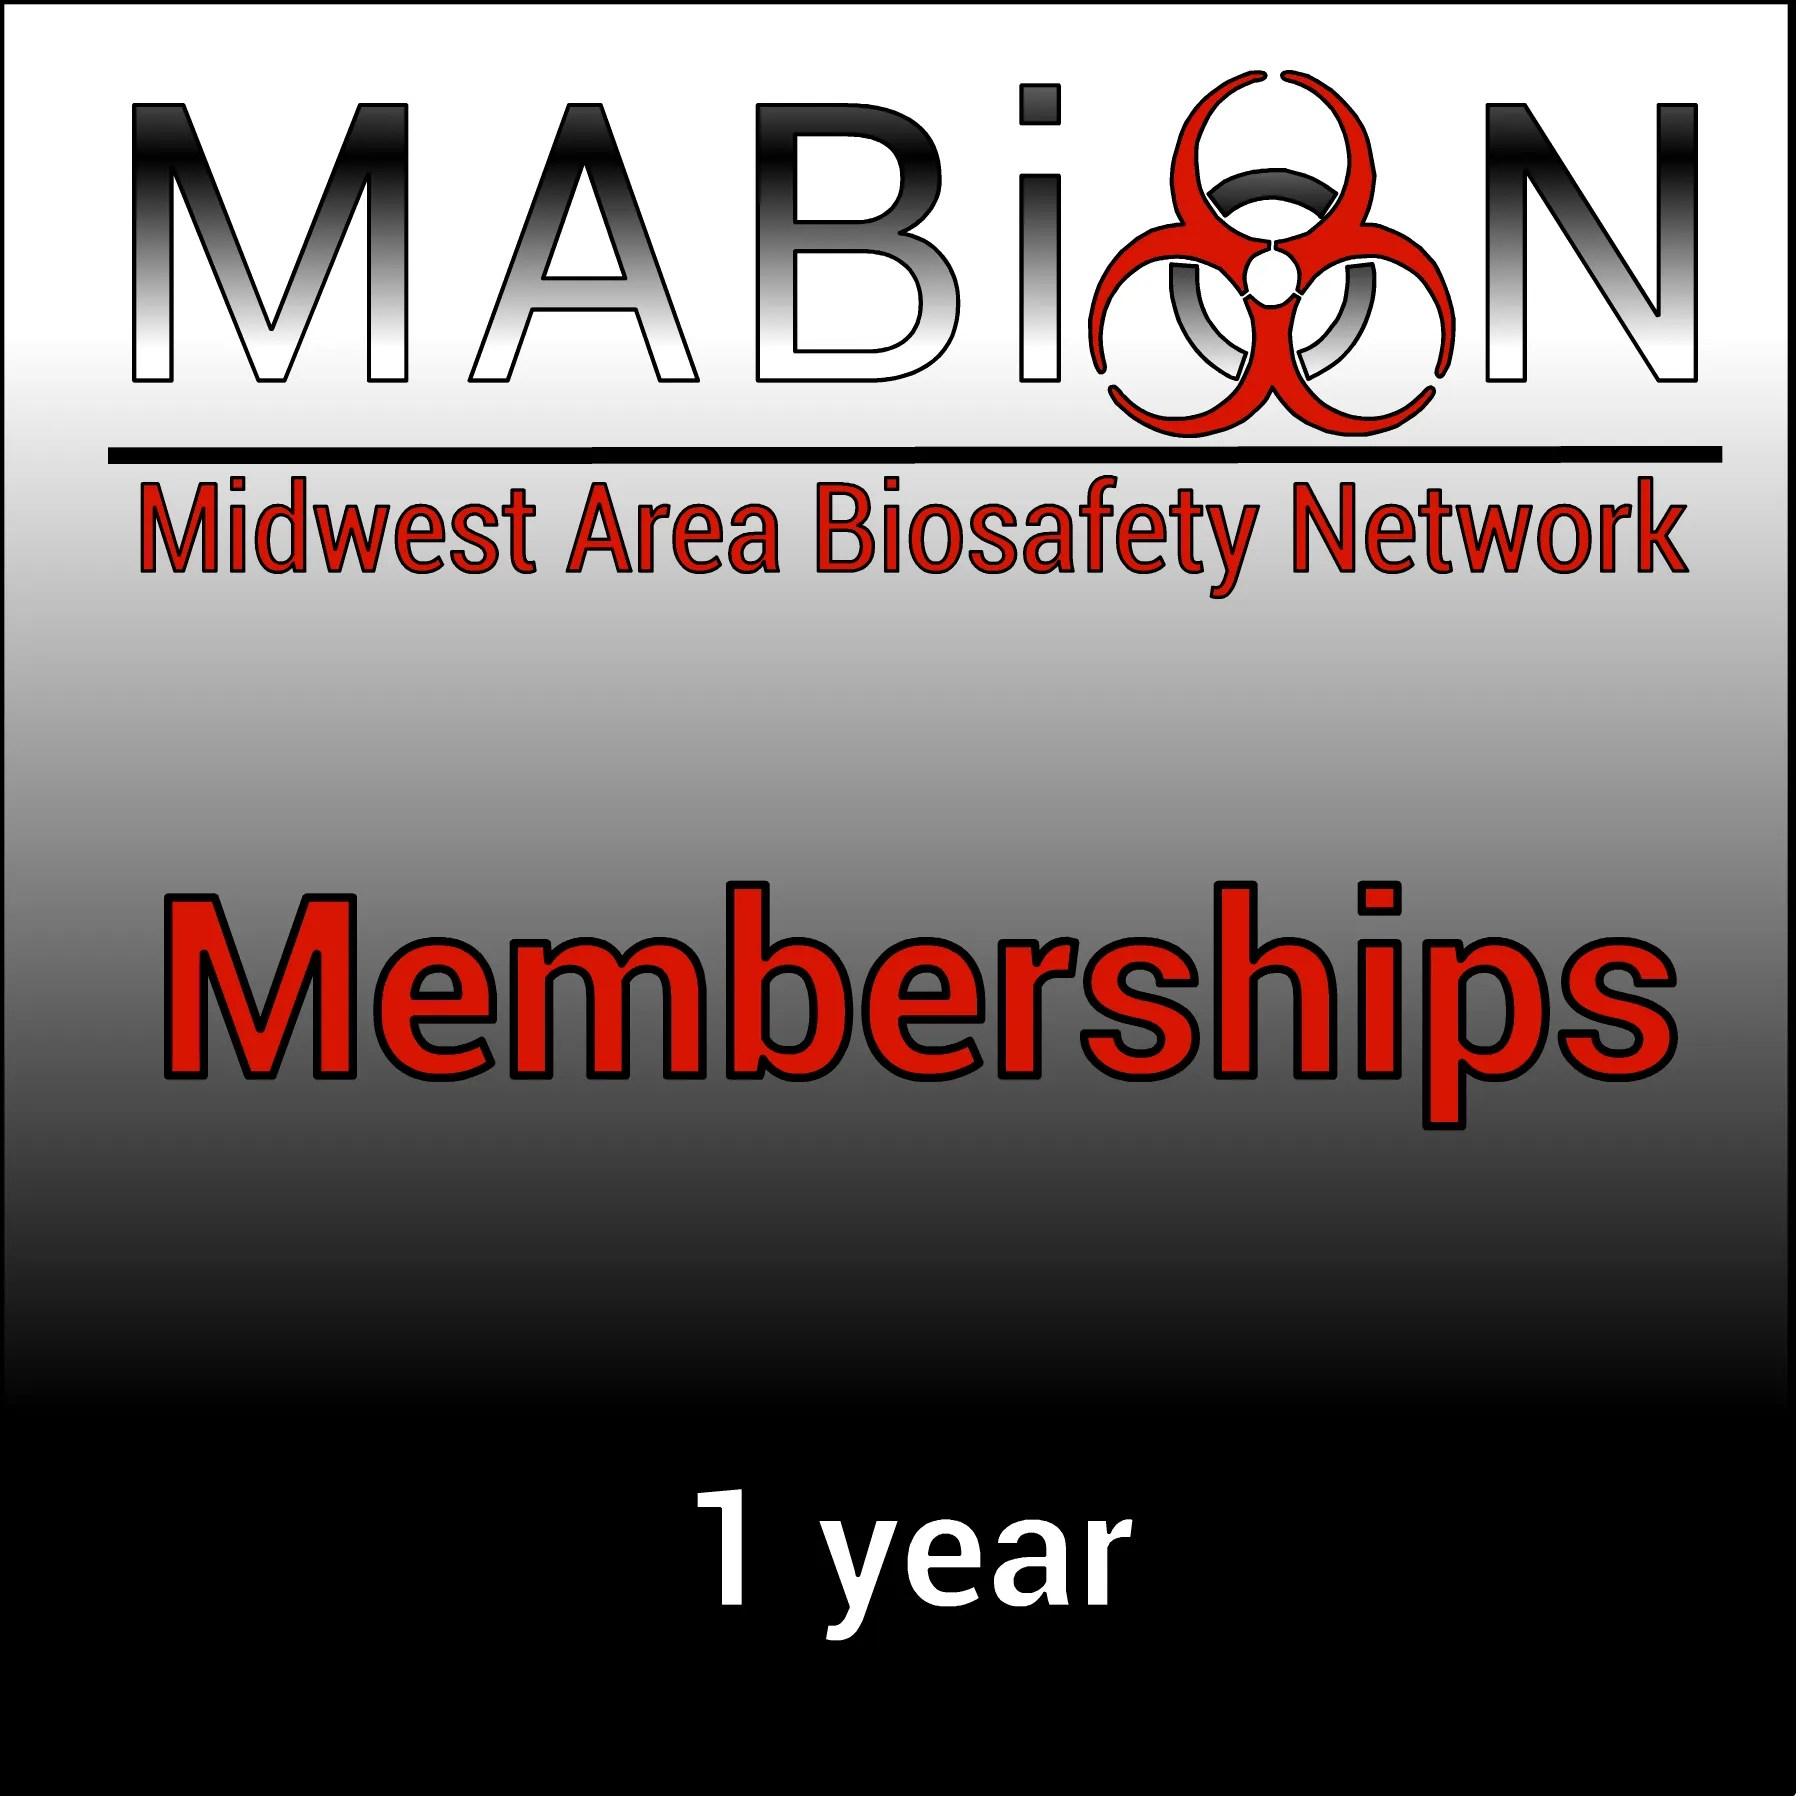 MABioN Membership